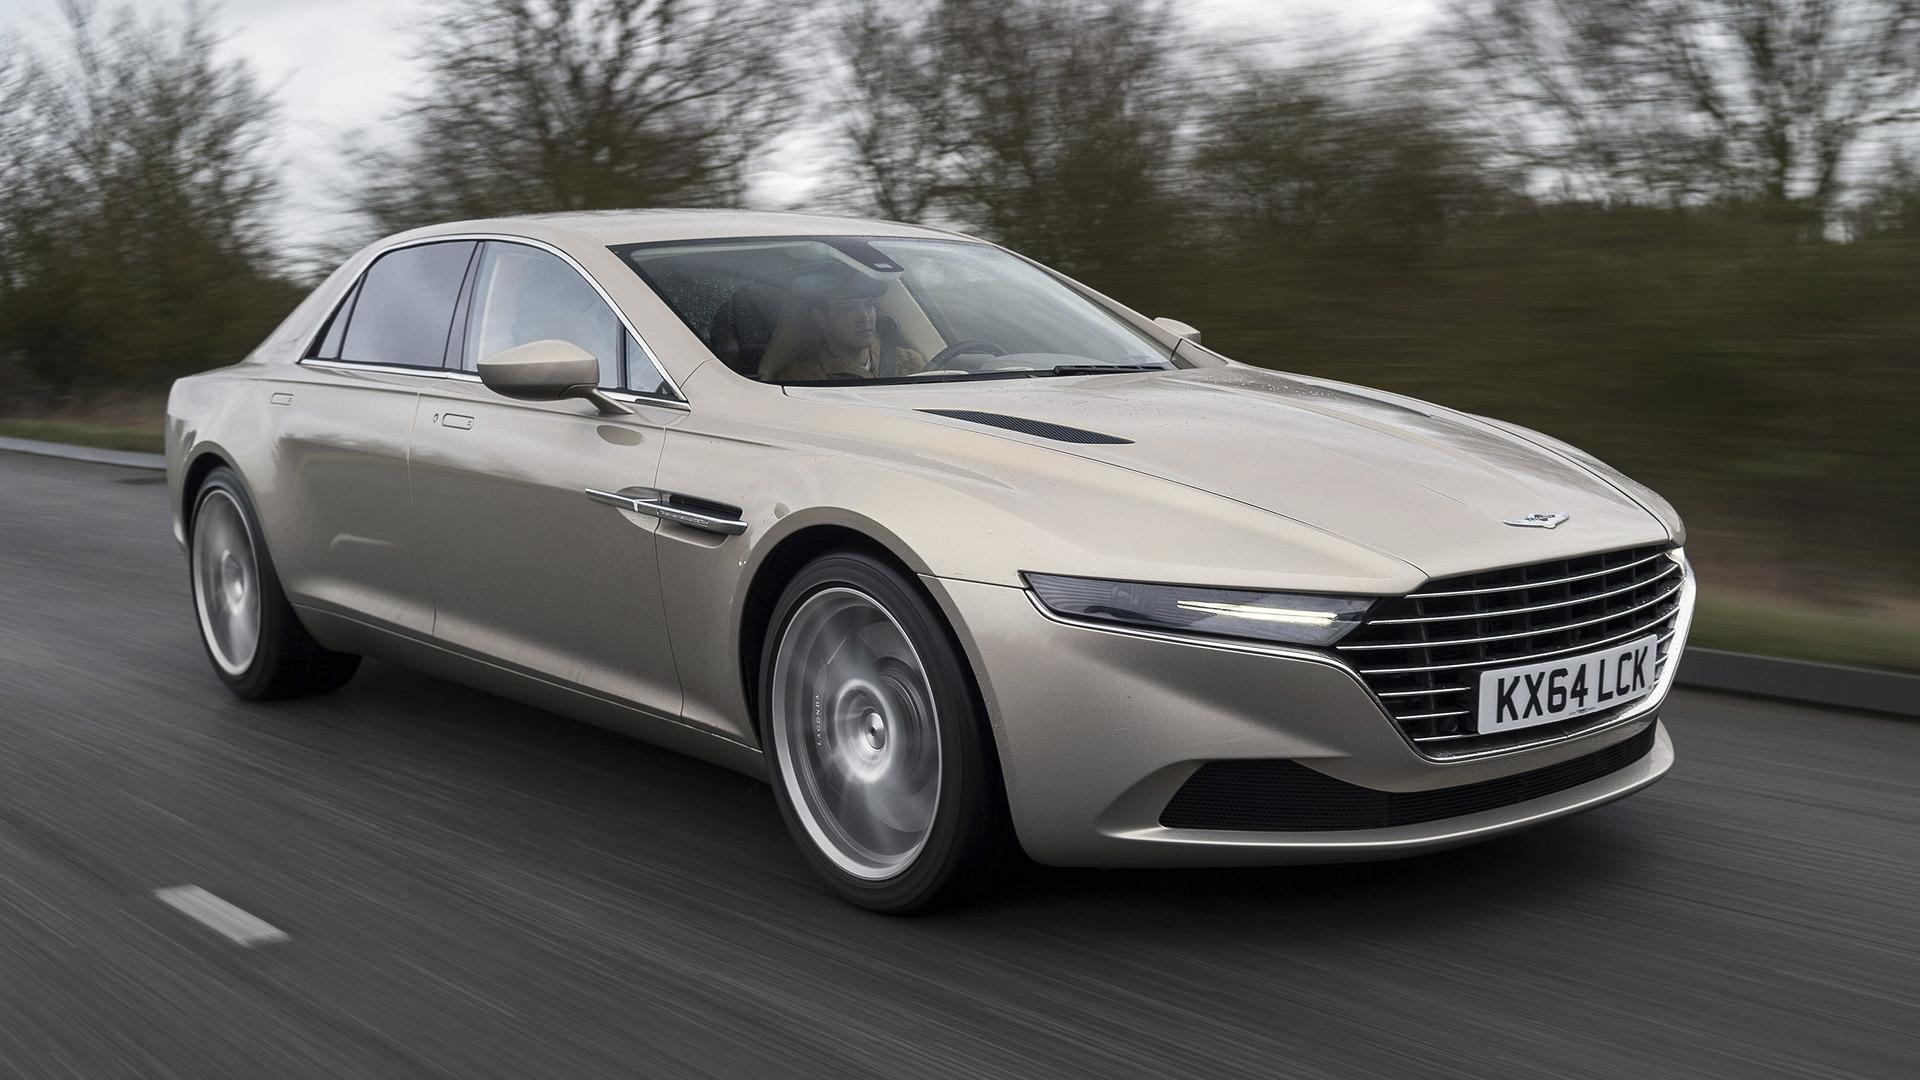 Aston martin of new england